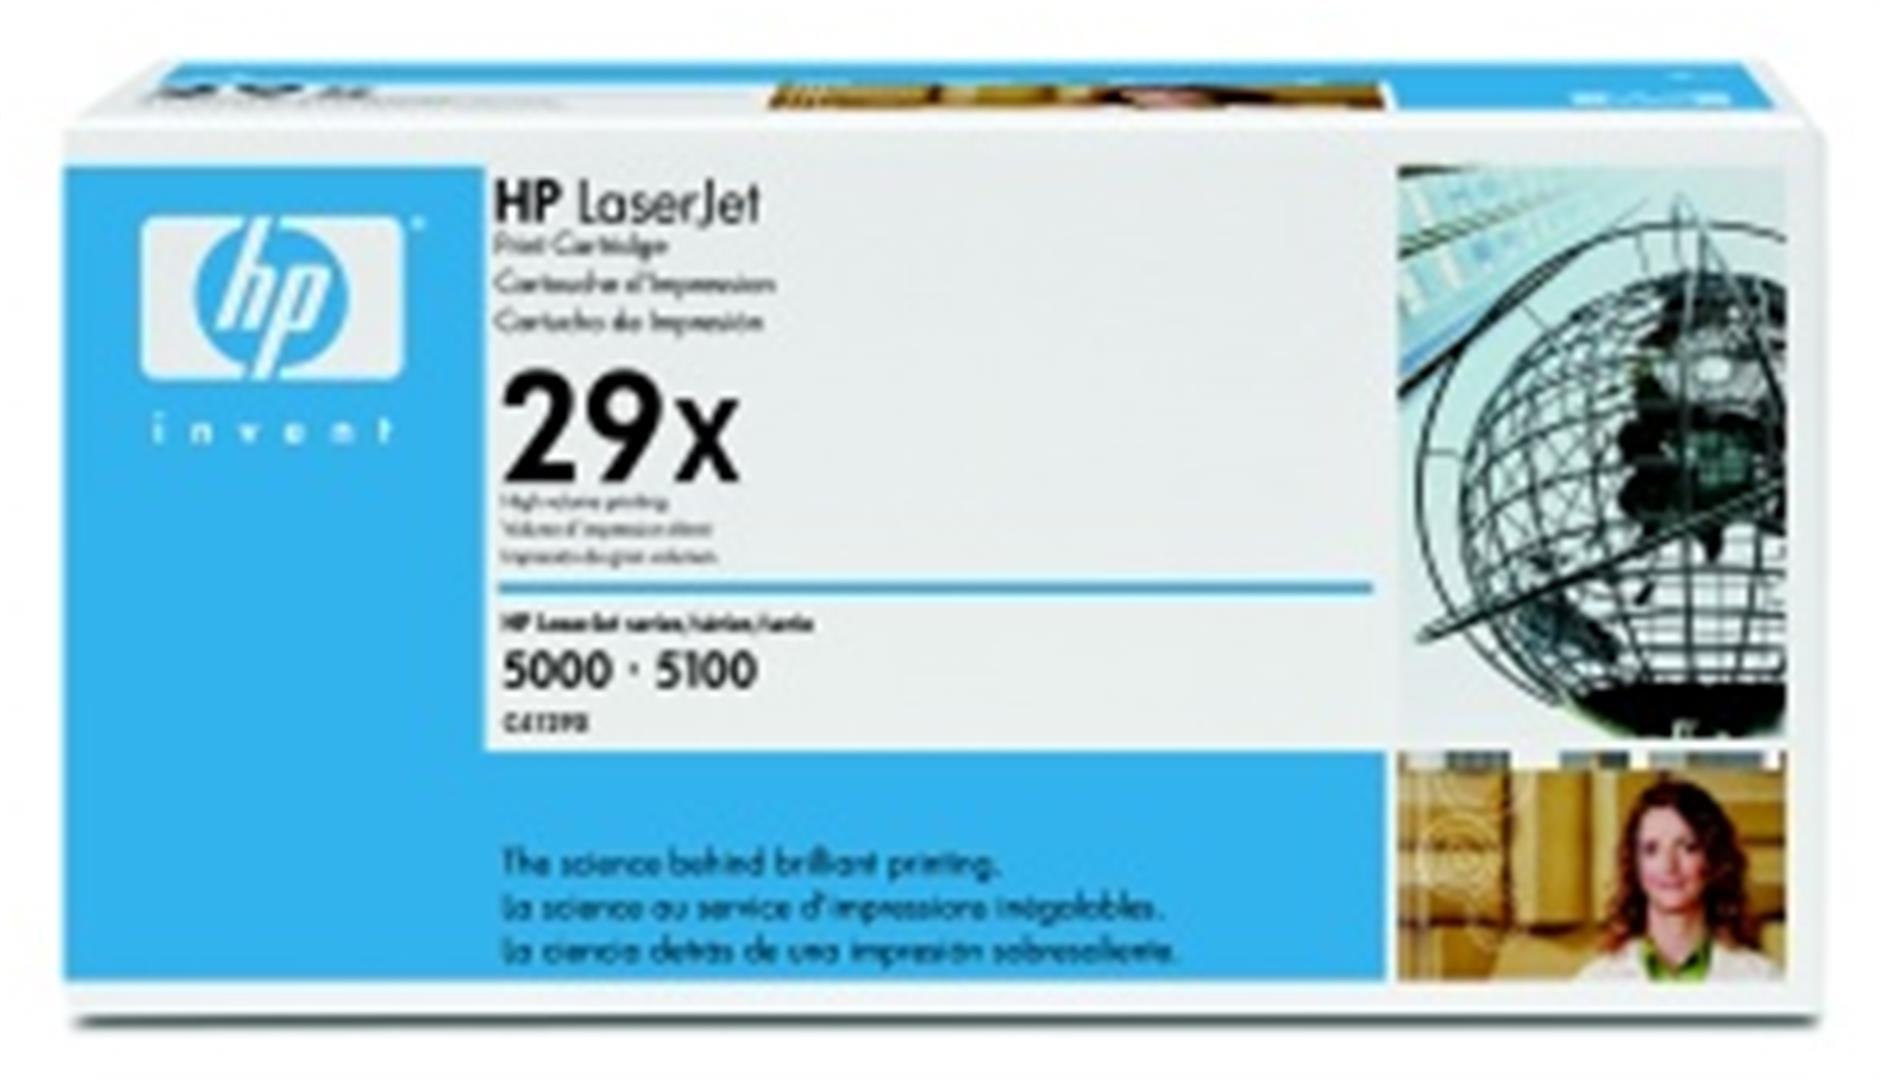 HP toner černý, ultraprecise, velký, C4129X